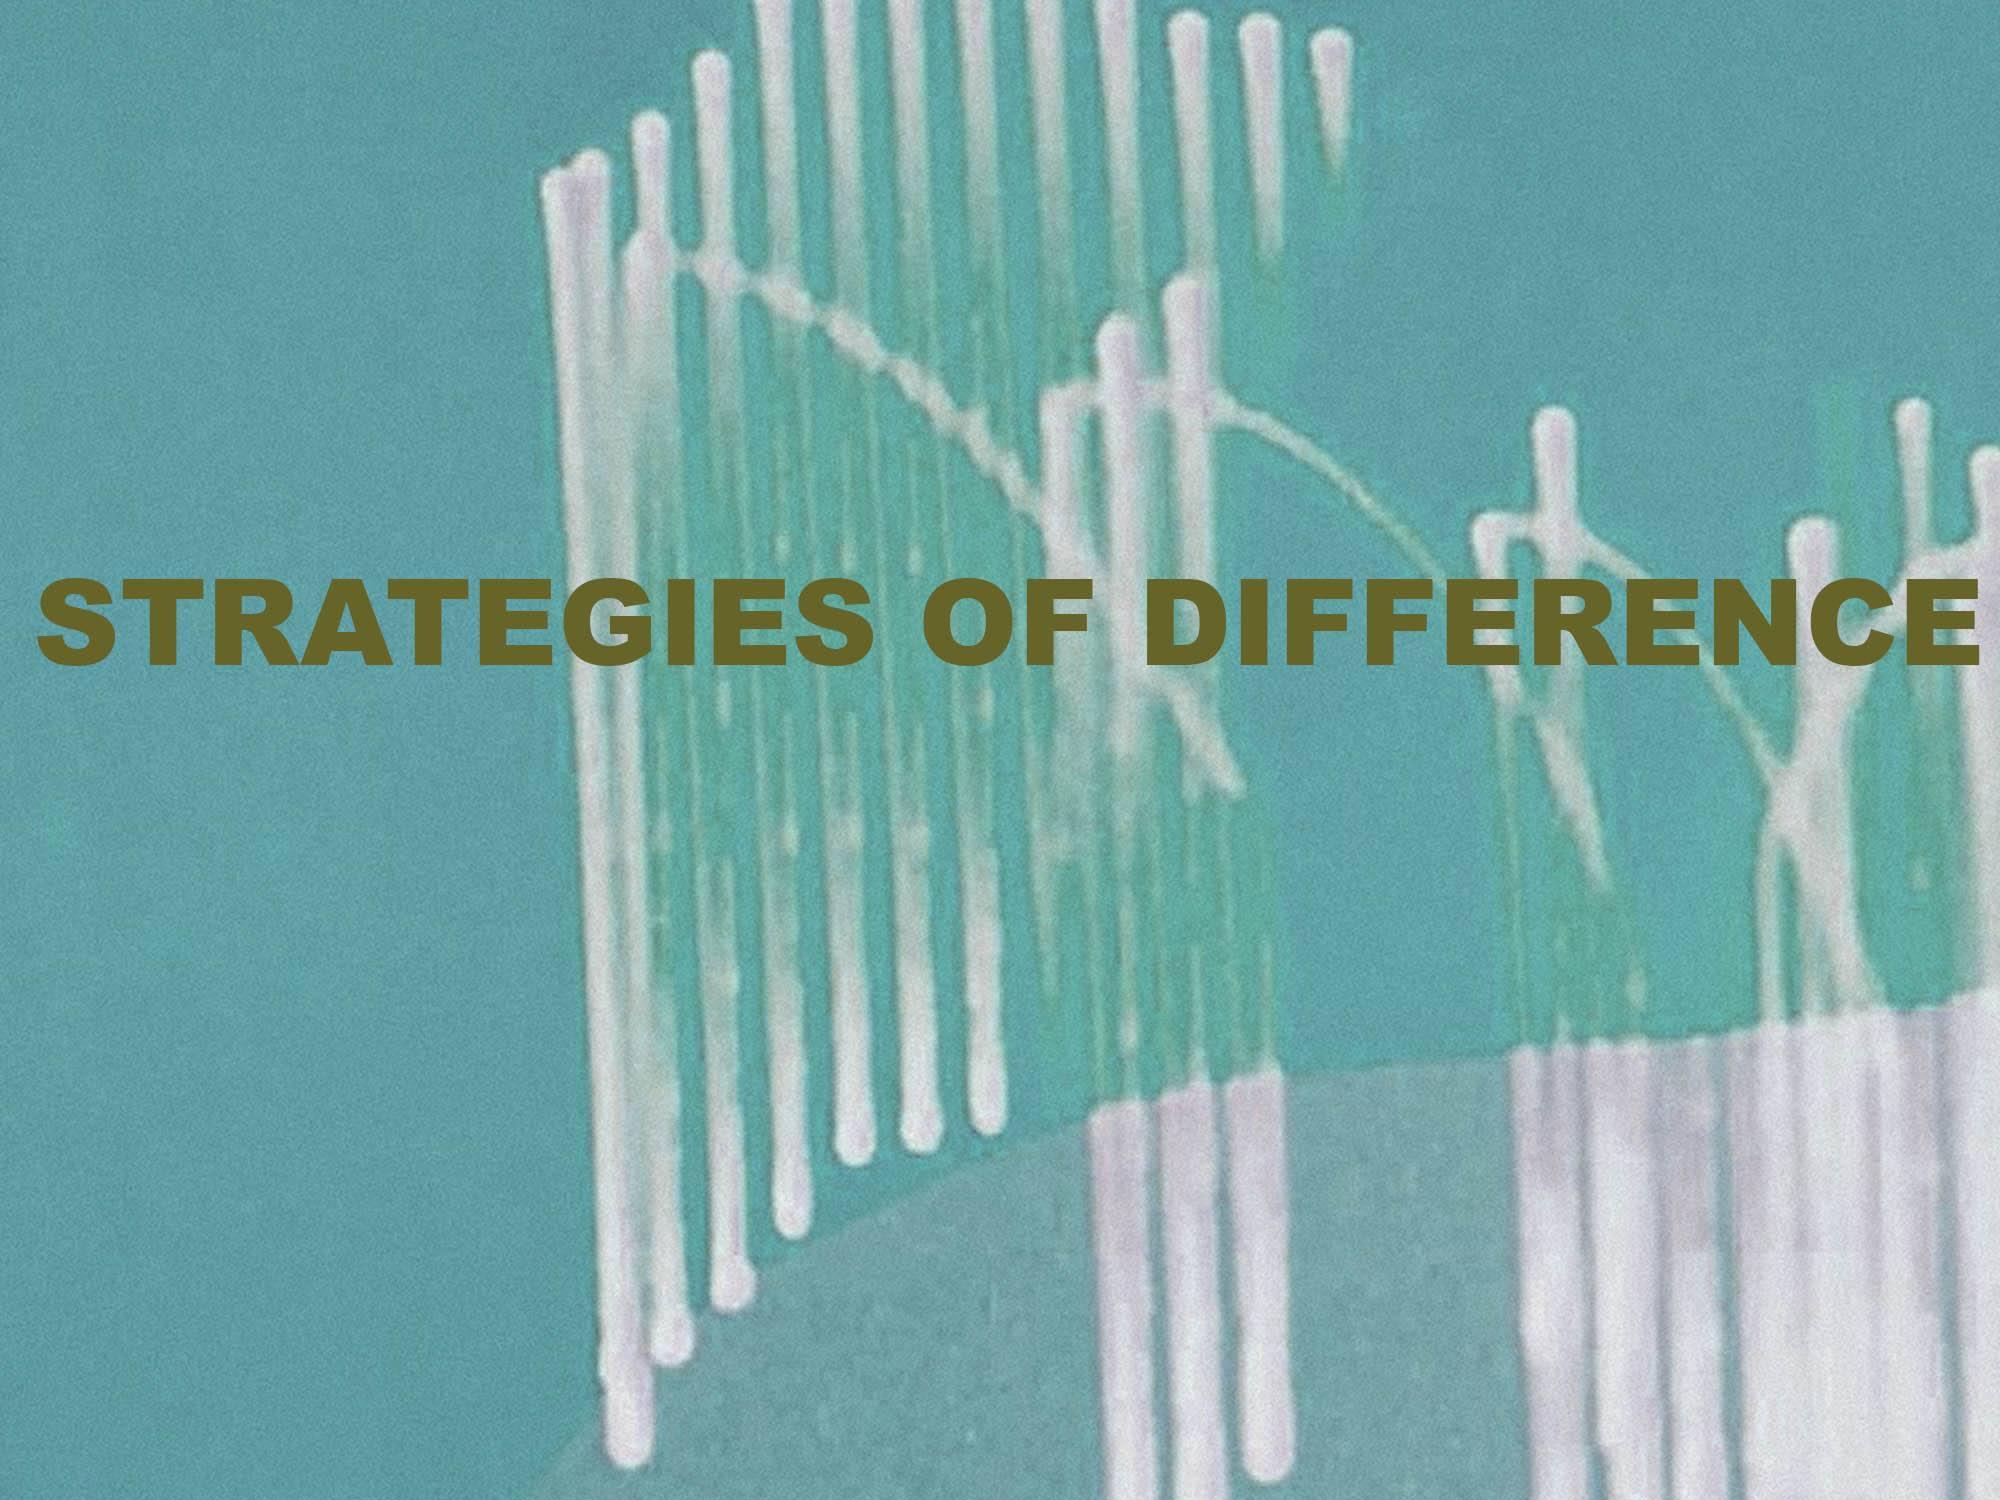 strategies of diffrences .jpg